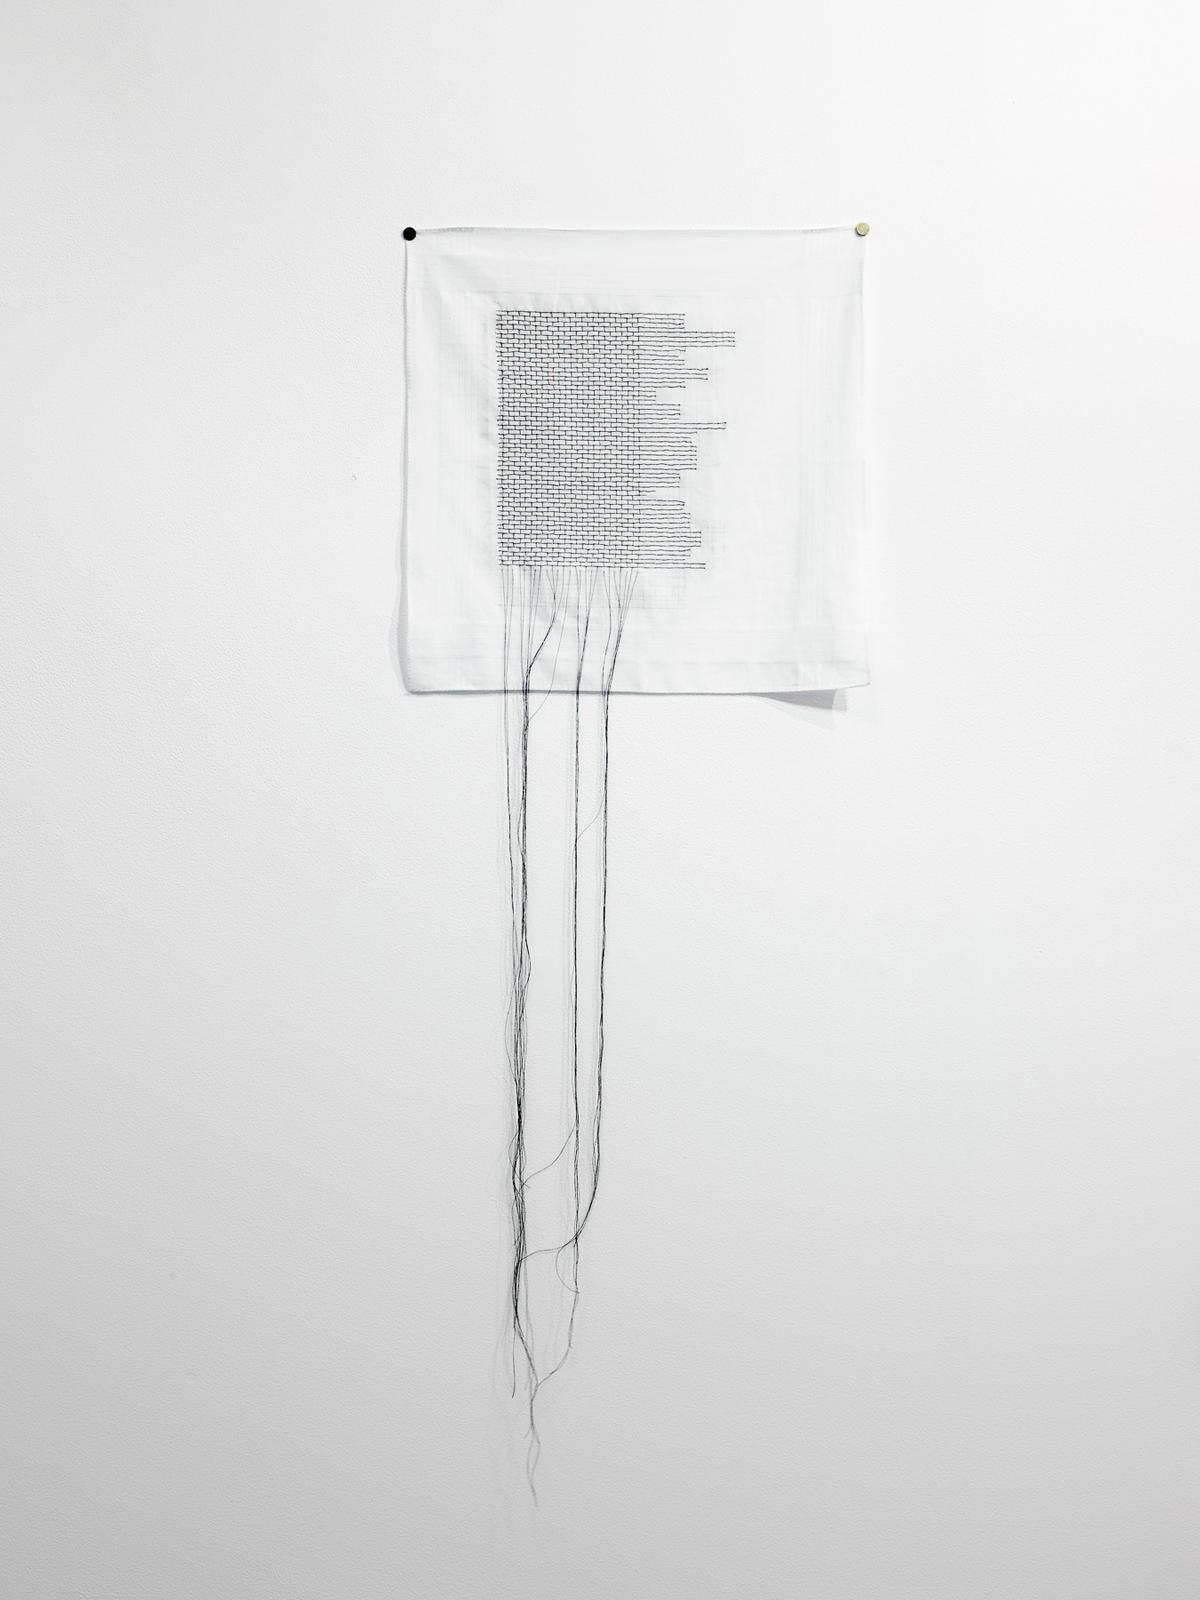 Sue Lorraine, The lost brick course,  2017 Men's handkerchief and cotton thread.